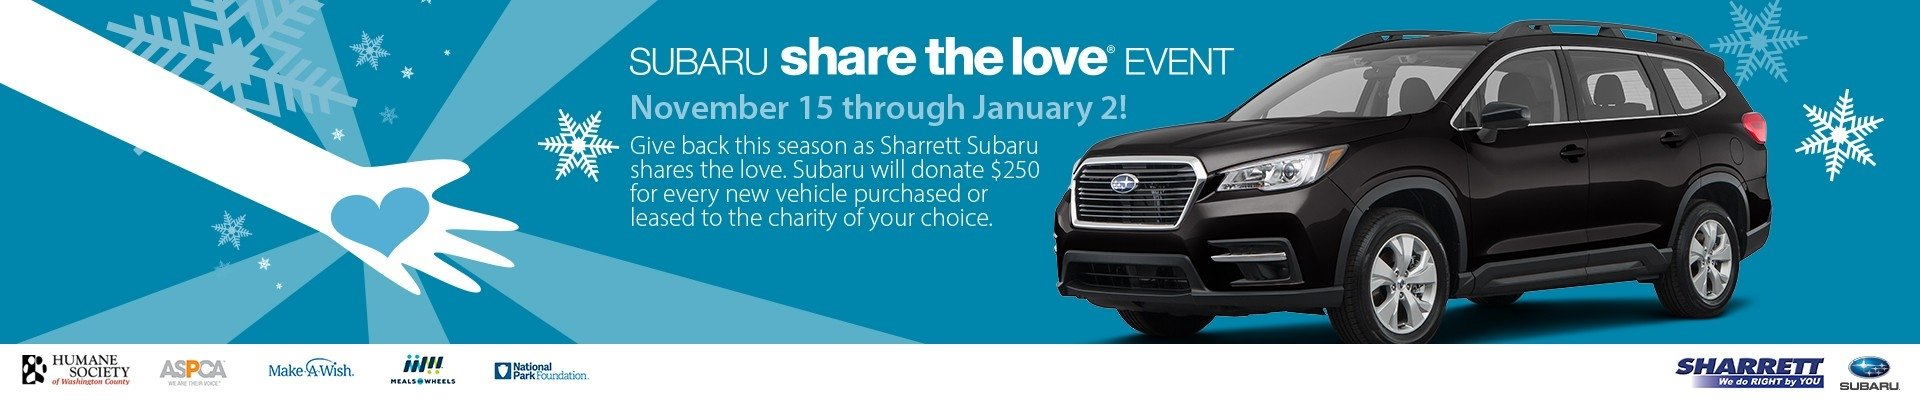 Sharrett Subaru Share the Love Event: Nov. 15 - Jan. 2!